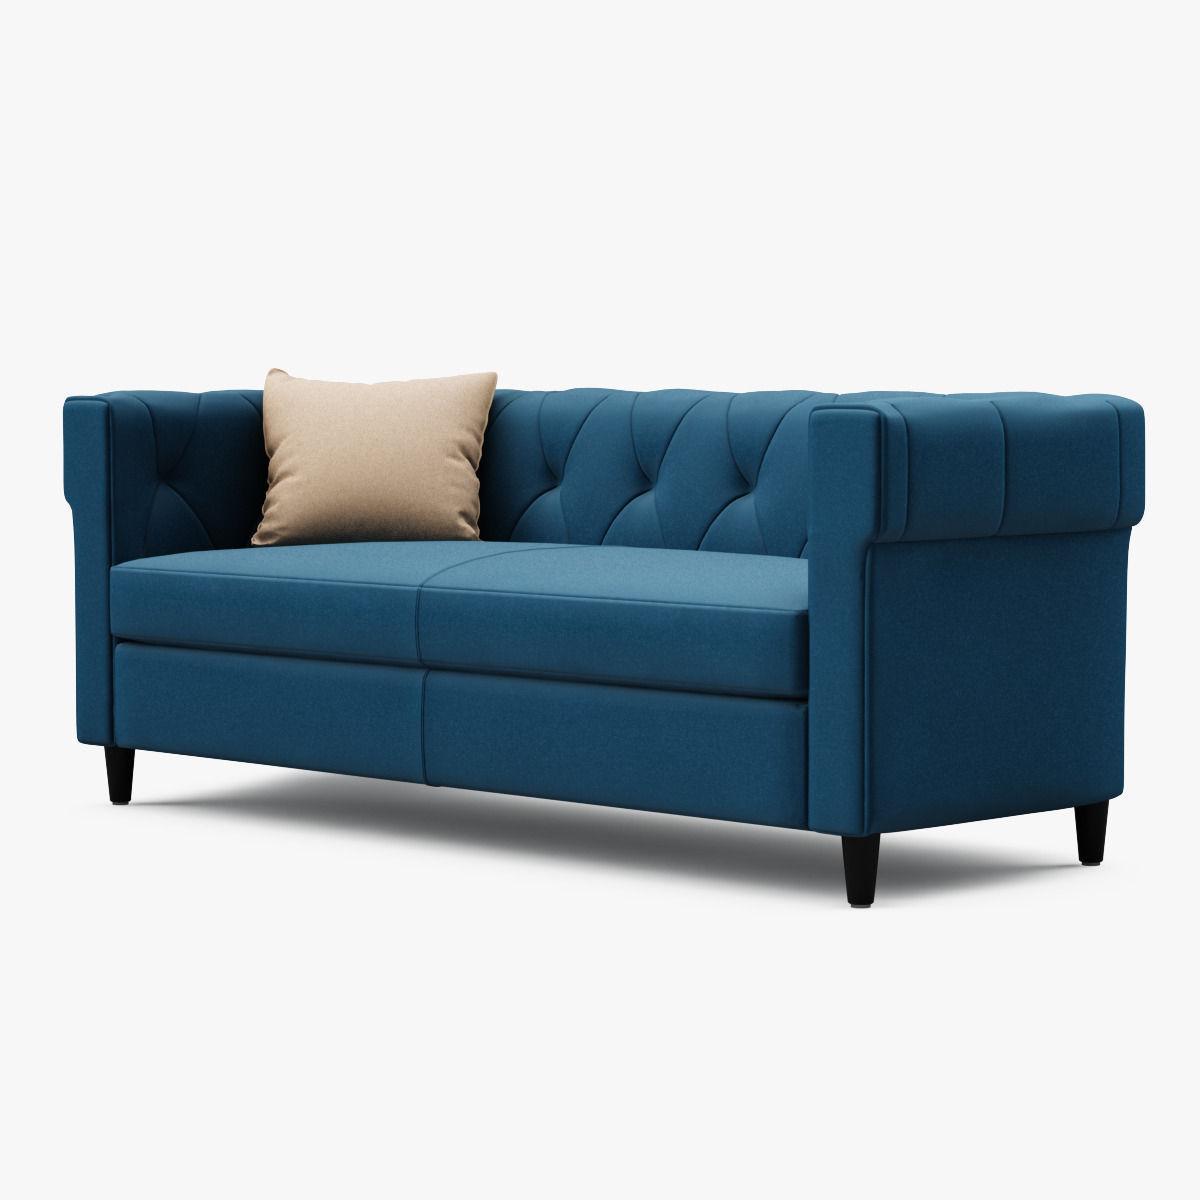 Superieur ... Chester Tufted Upholstered Sofa 3d Model Max Obj Mtl Fbx 2 ...